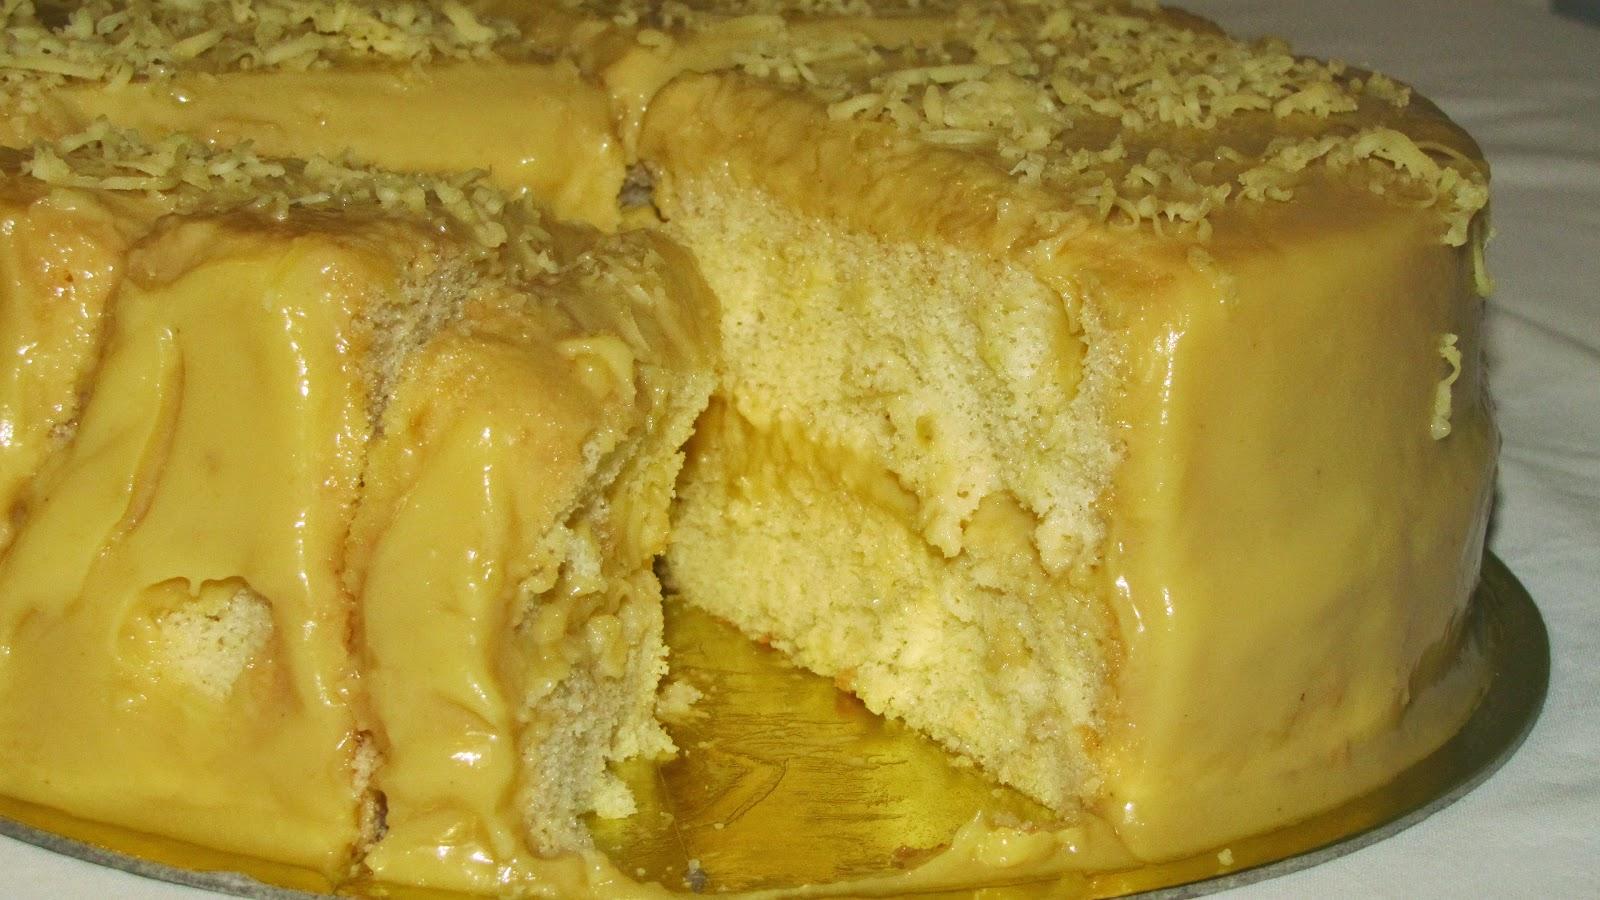 FTW! Blog, yema cake, cebu cardinal bakeshop, #032eatdrink